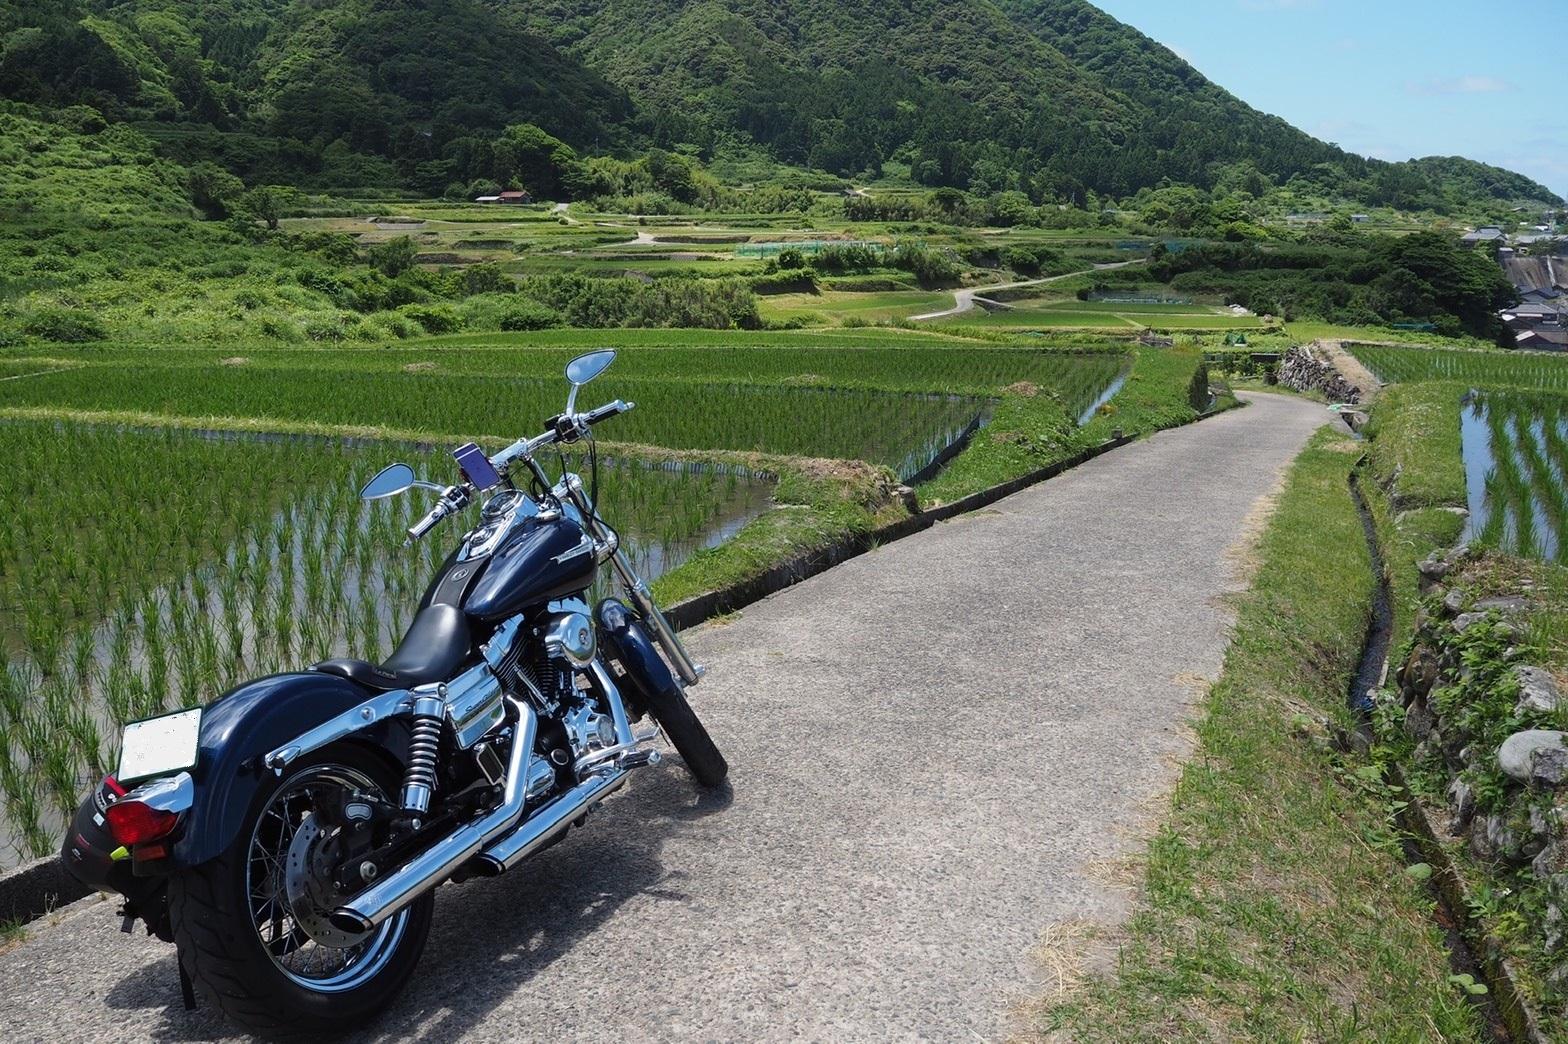 harleydavidson-motorcycle-touring-blog-kyoto-tanngopeninsula-riceterraces-of-sodeshi-view-3.jpg